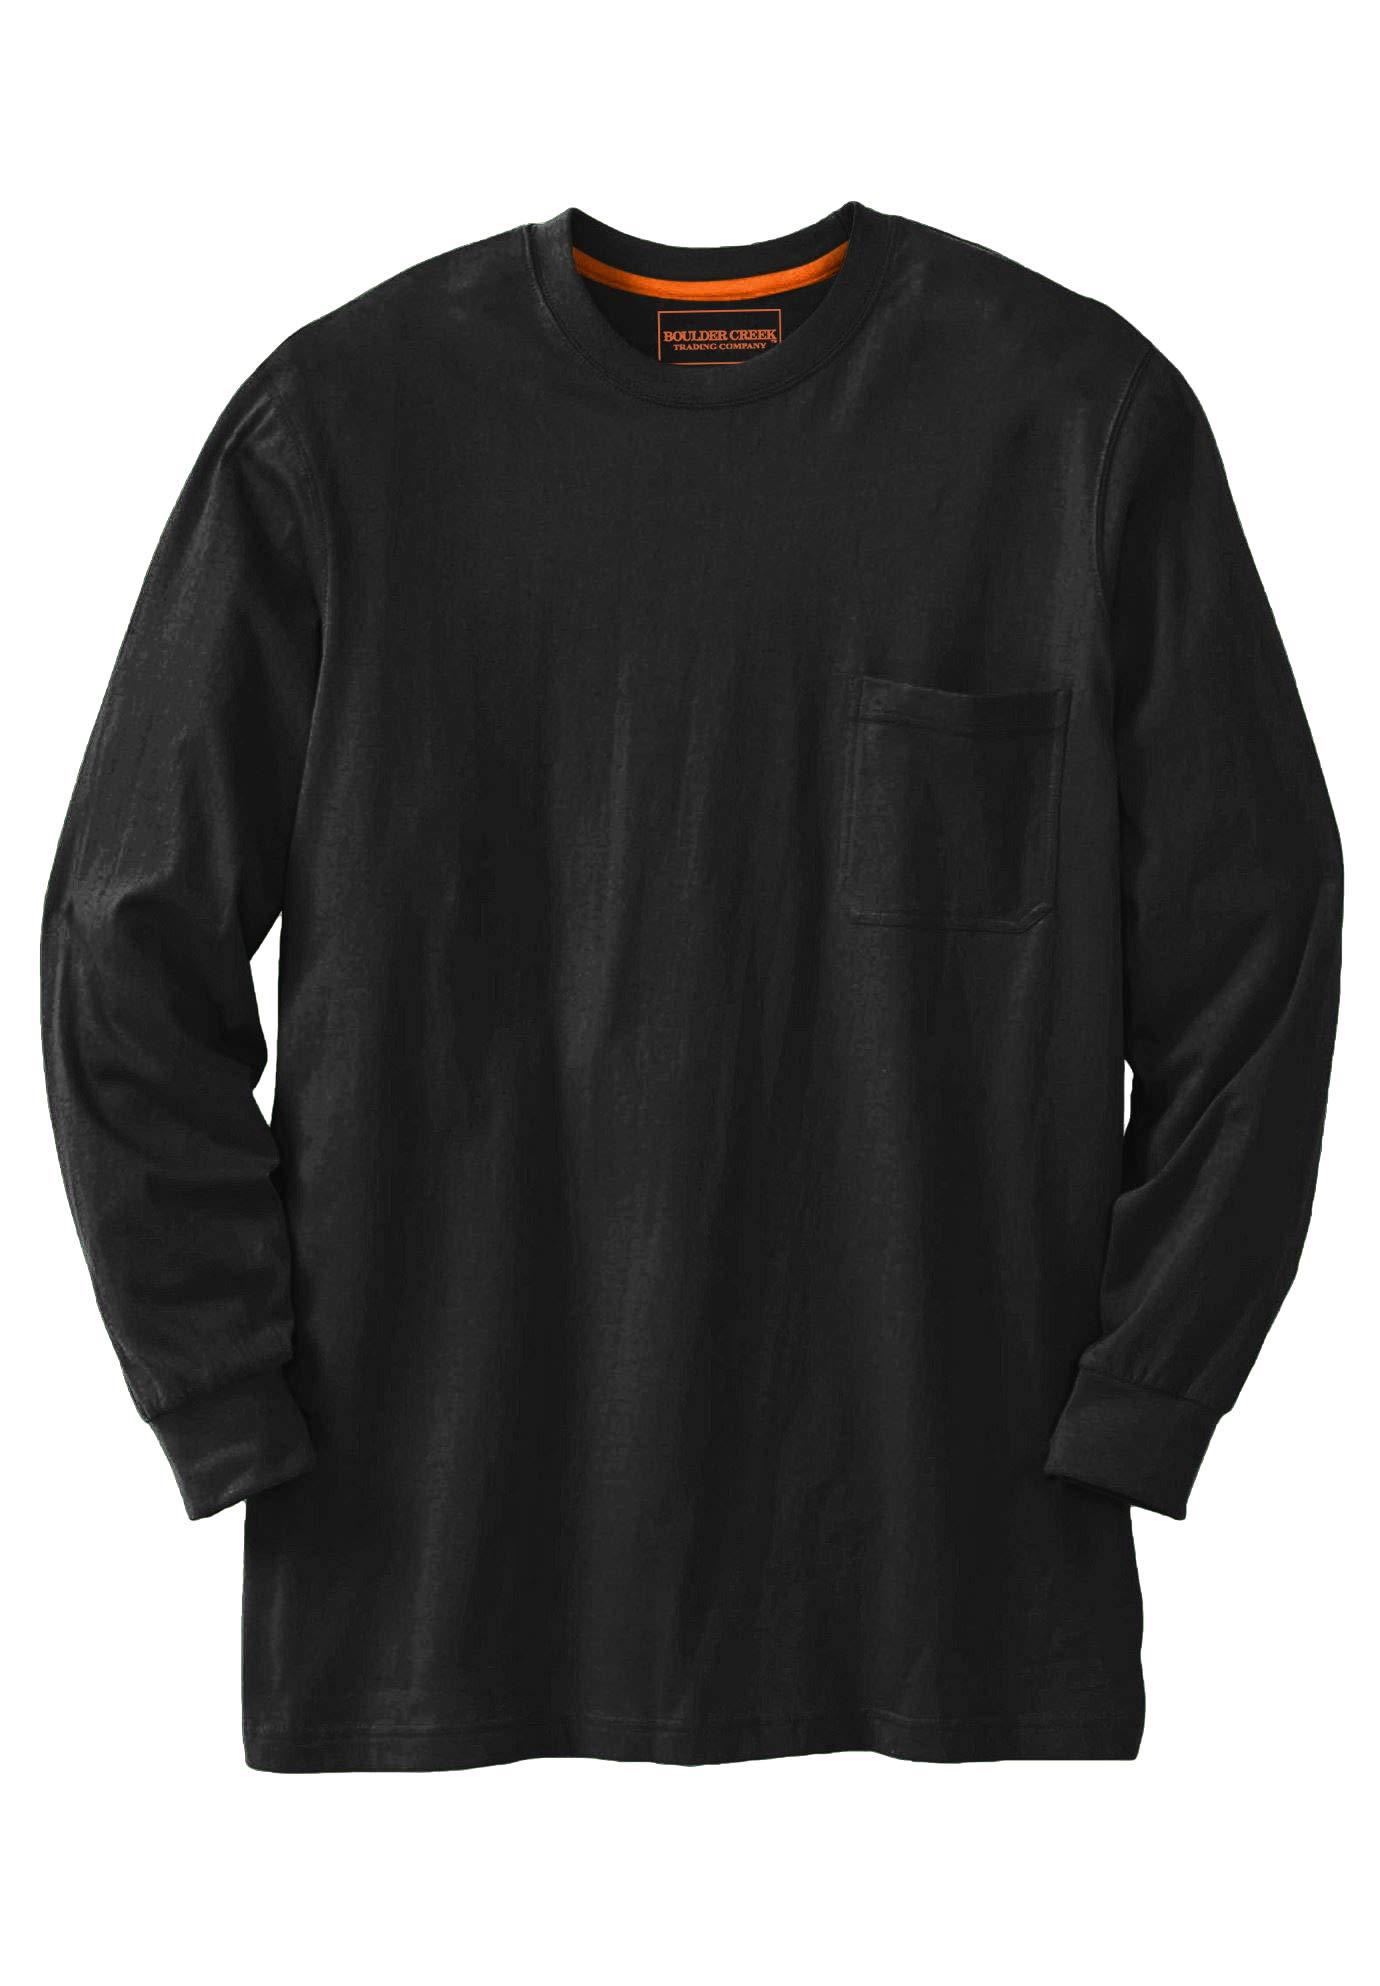 Boulder Creek by Kingsize Men's Big & Tall Heavyweight Crewneck Long-Sleeve Pocket T-Shirt